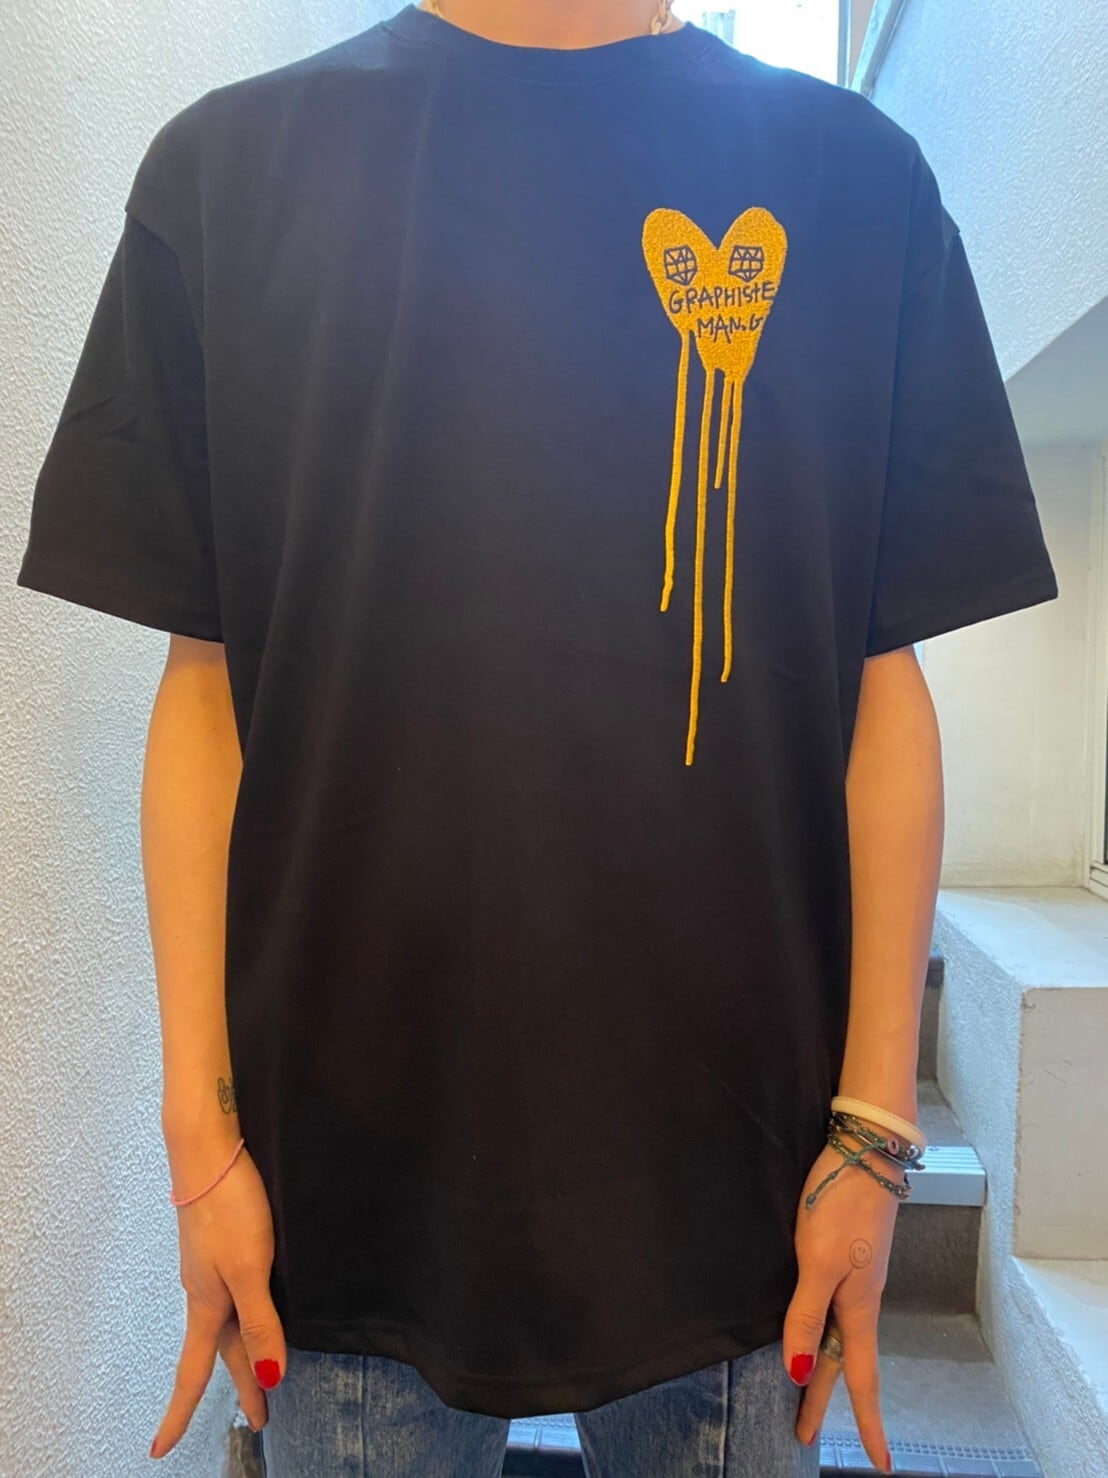 【MAN-G】フロントハート刺繍Tシャツ